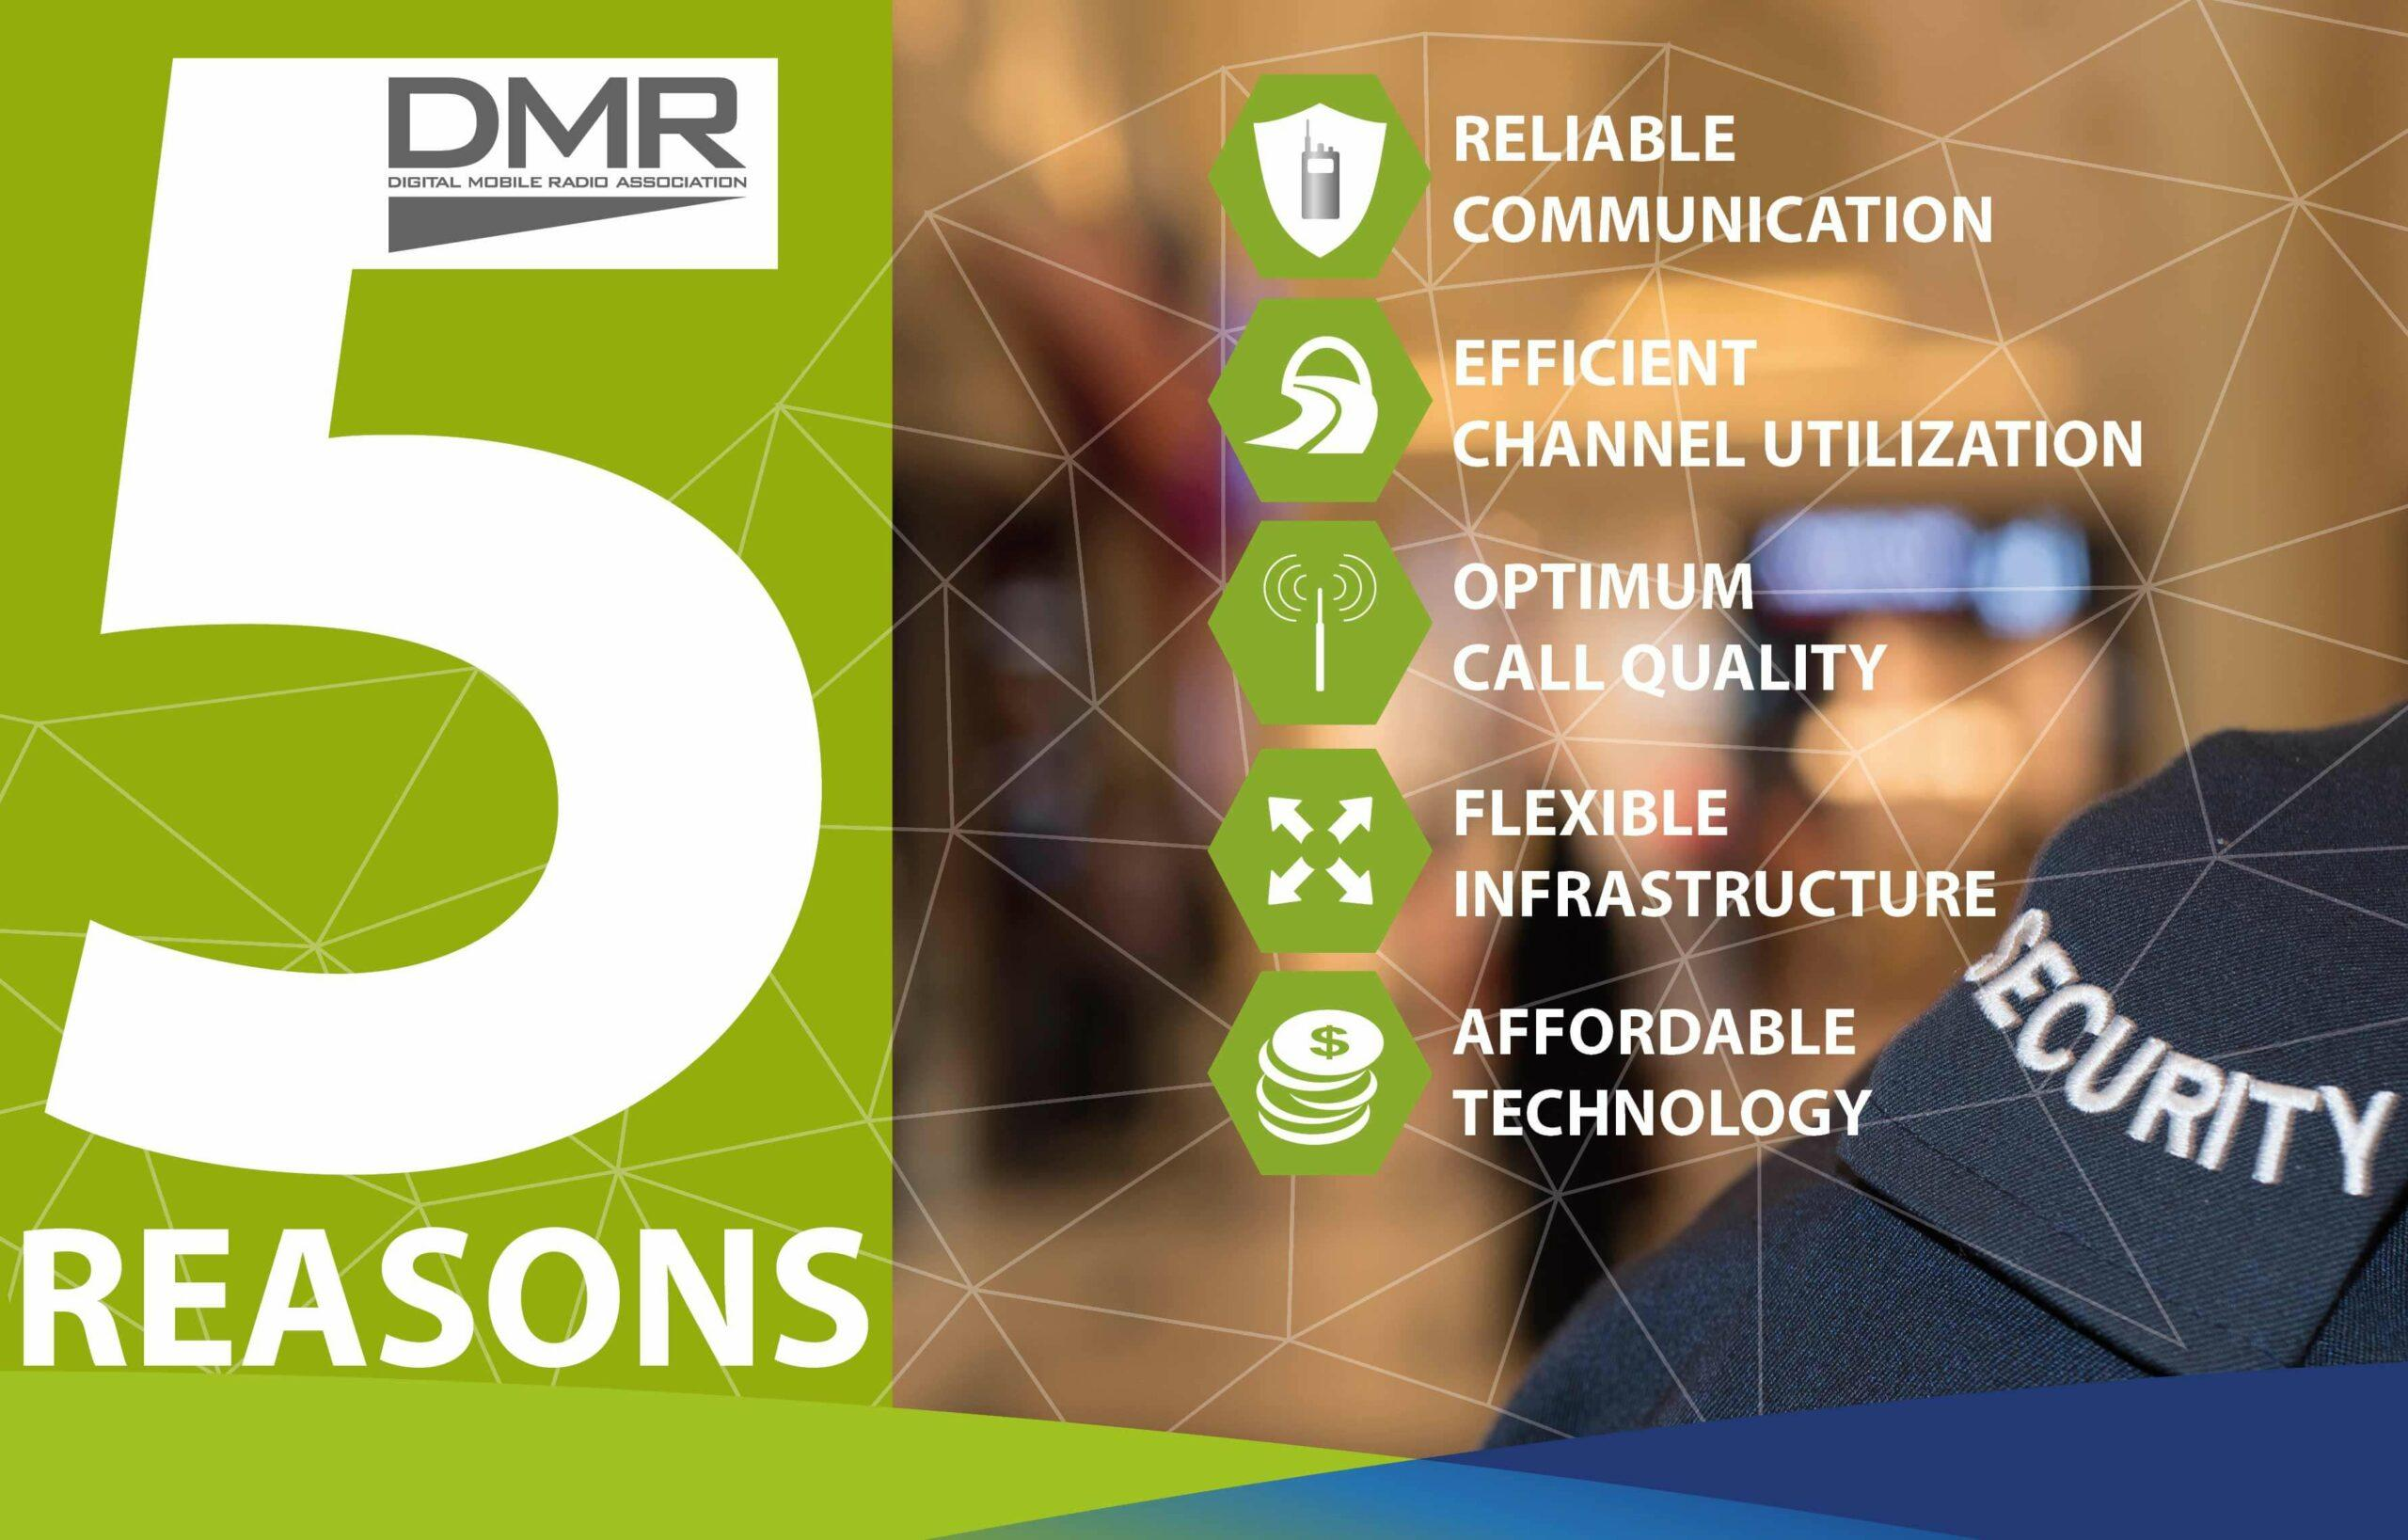 Hytera Mobilfunk DMR 5 Reasons